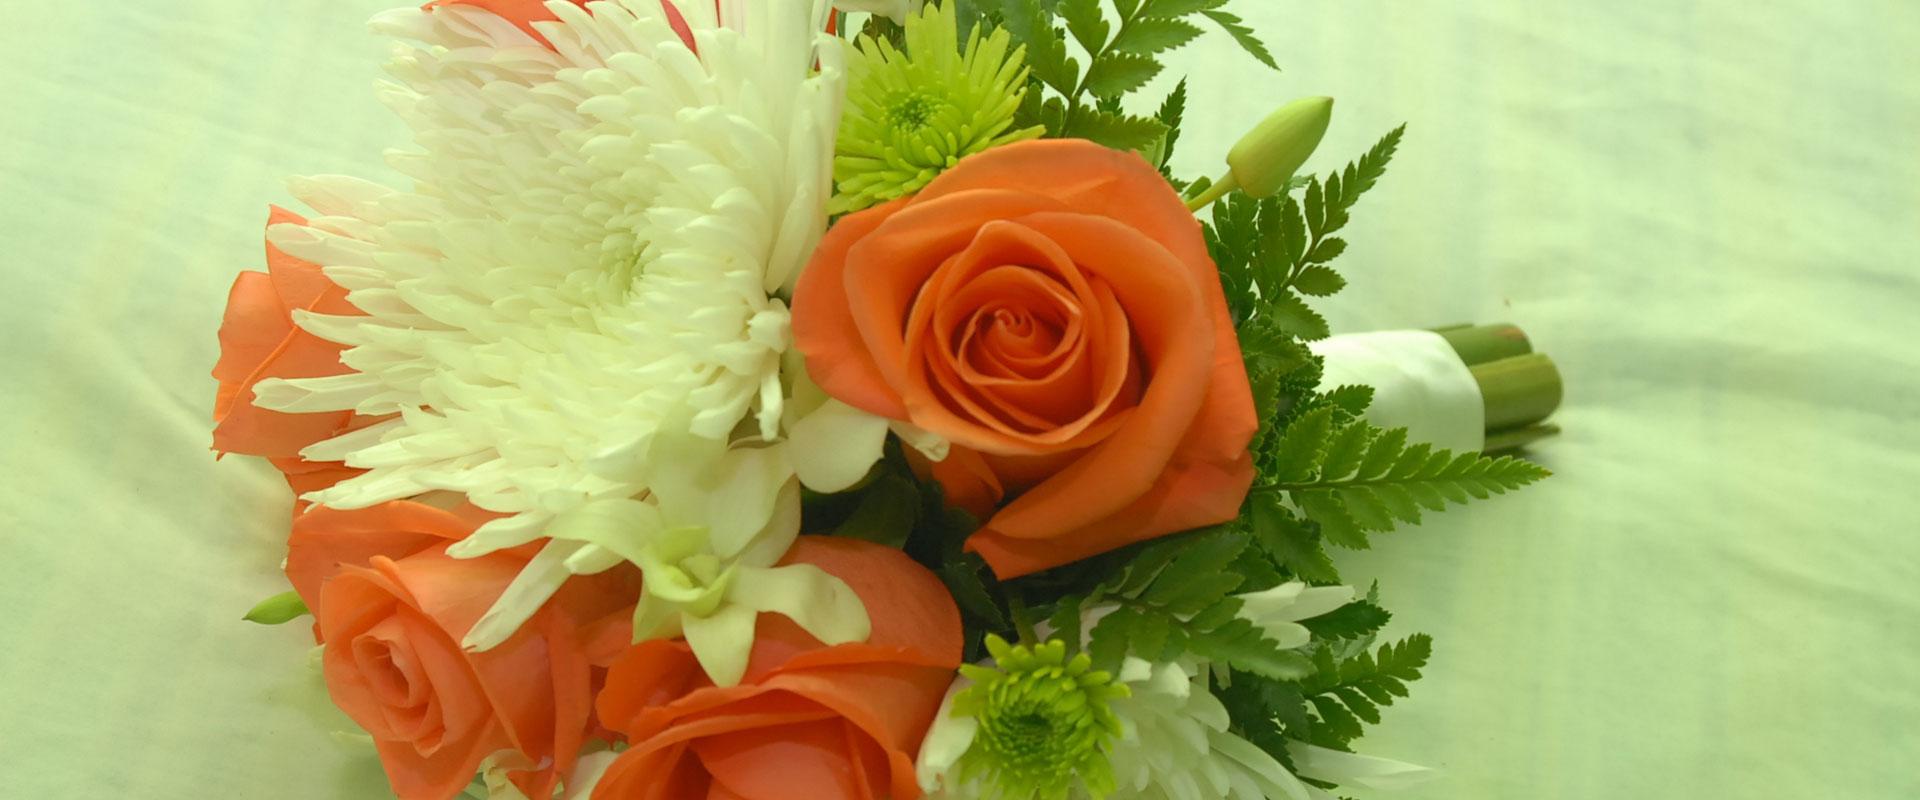 faithful-wedding-gallery-floral-arrangements-1